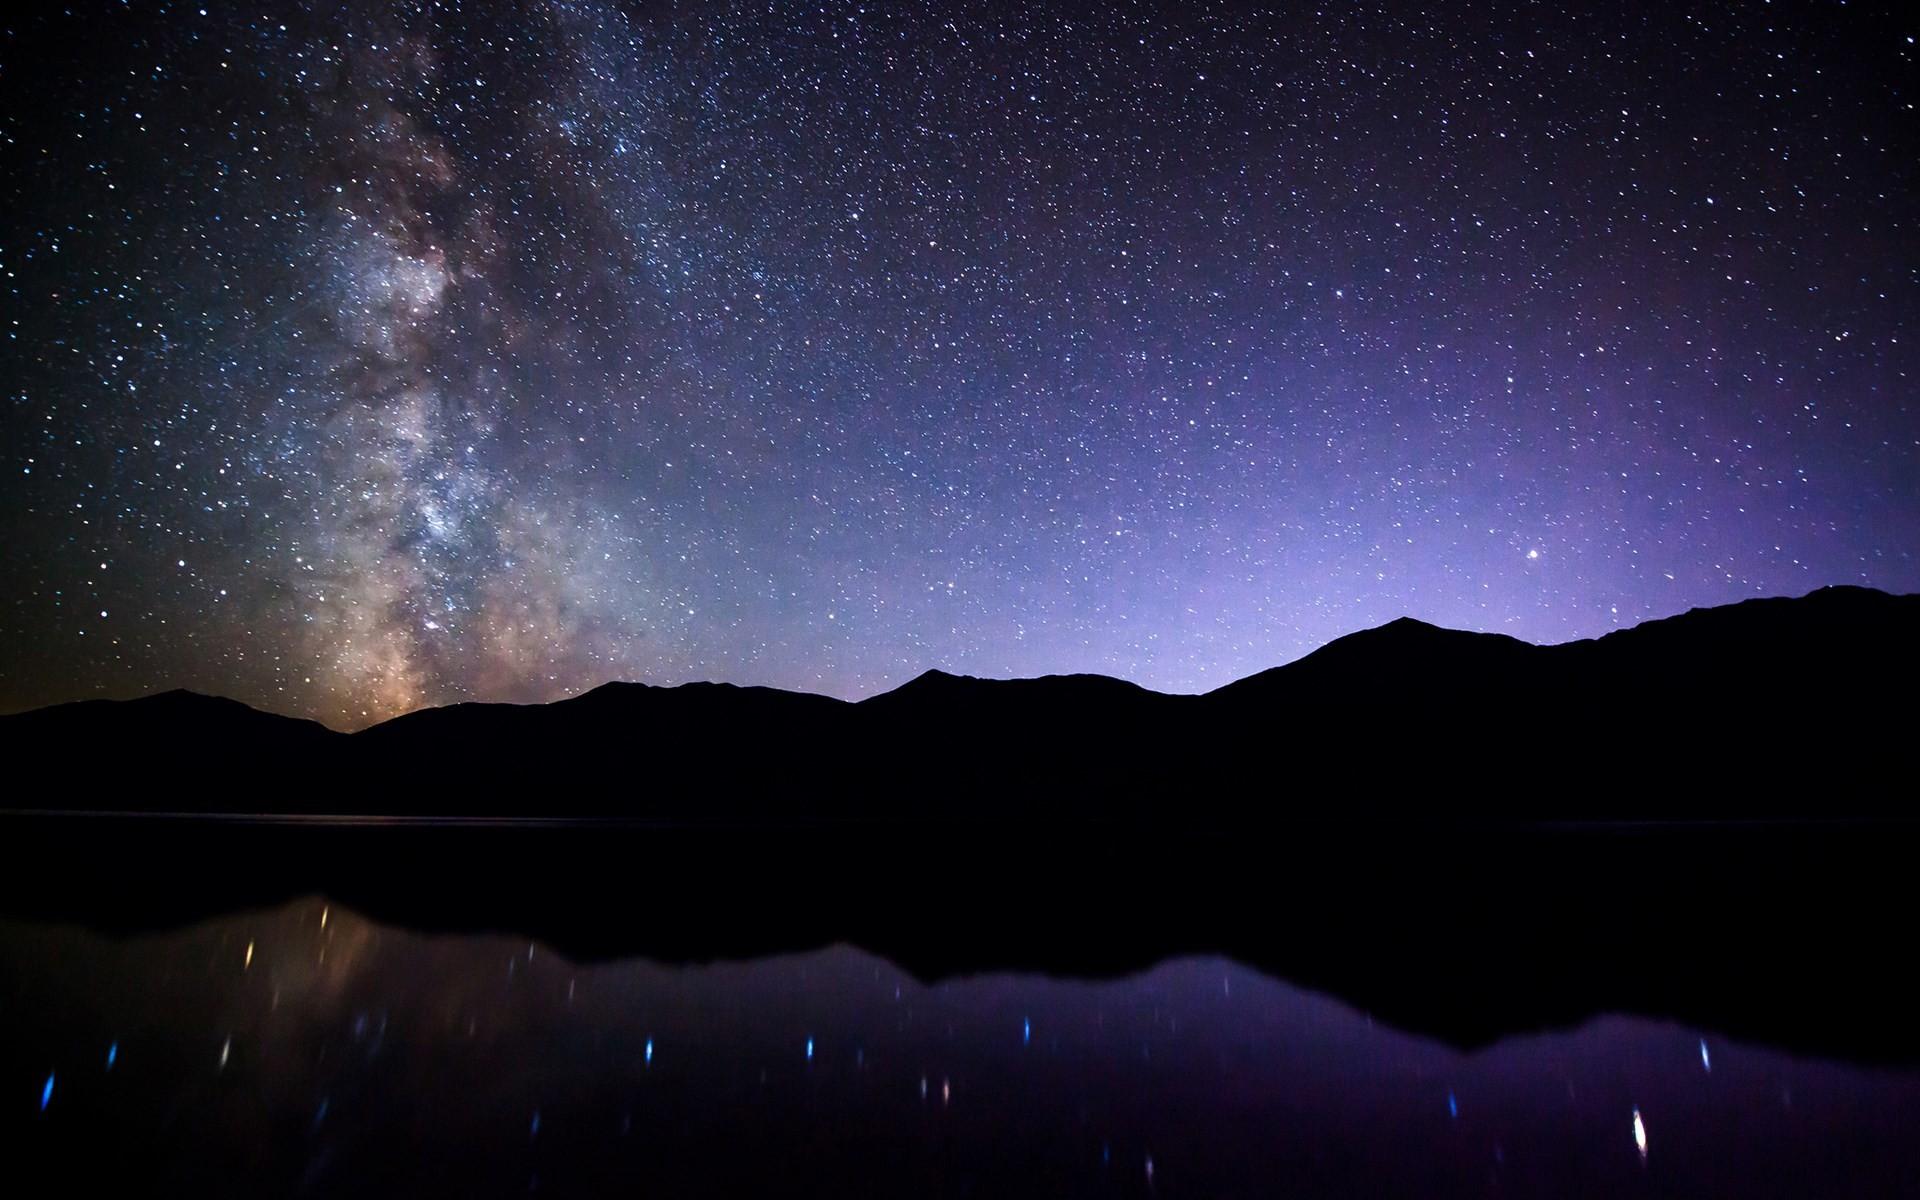 Milky Way Wallpaper (77+ immagini)